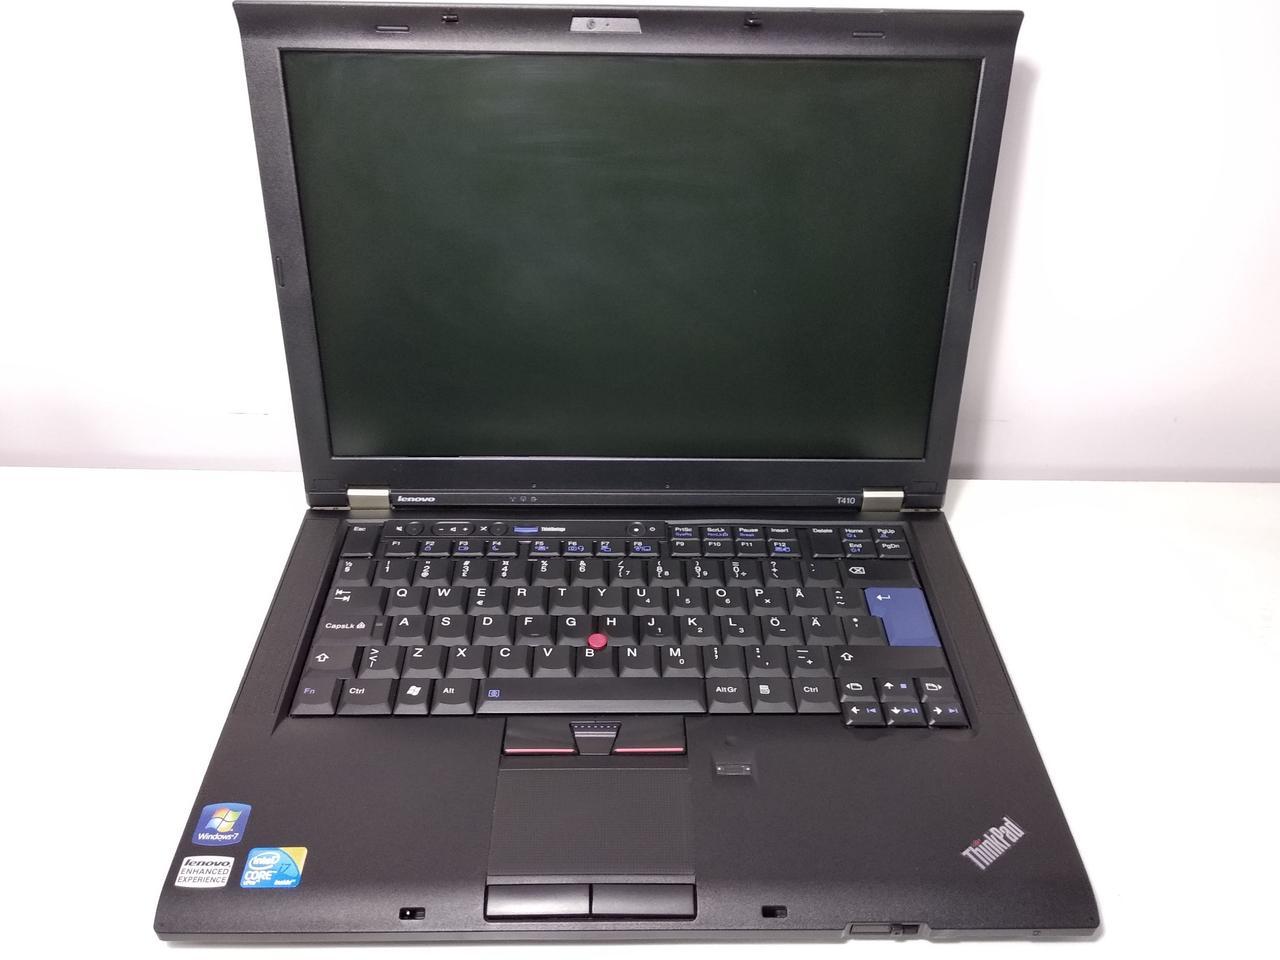 "Ноутбук Lenovo ThinkPad T410 /Intel Core i7-620M 3.33GHz/4Гб/14.1""/HD Graphics + NVIDIA NVS 3100M"